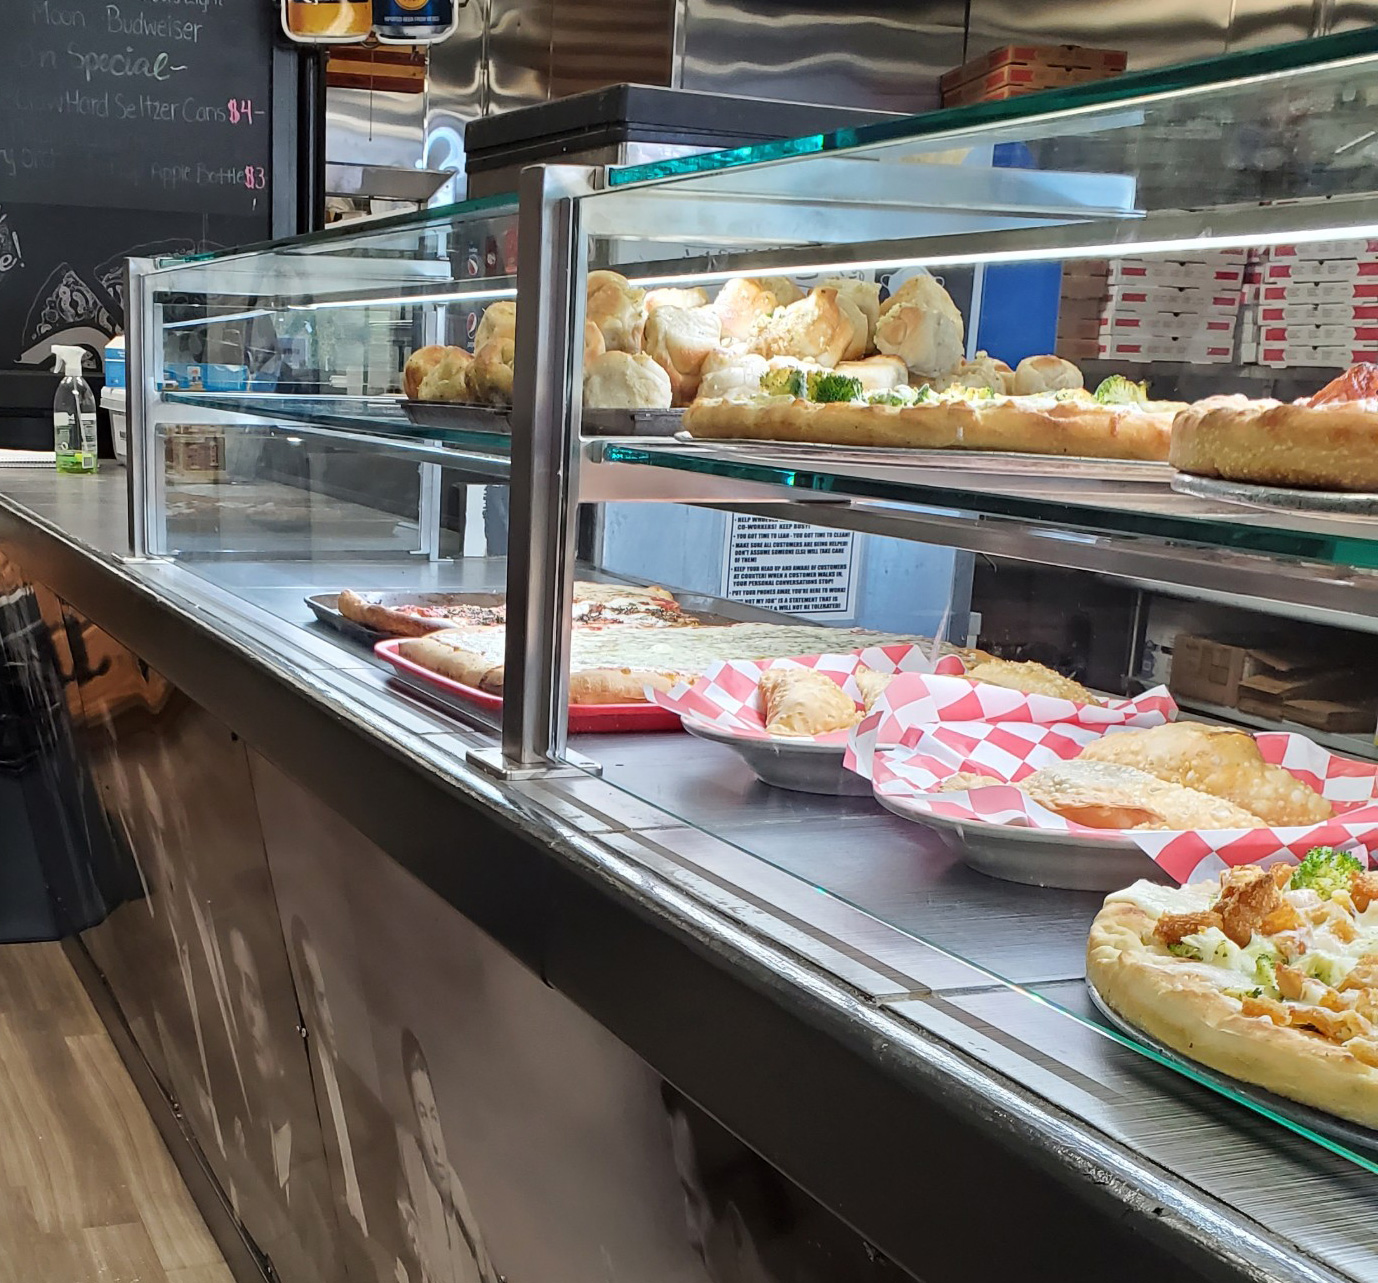 Satin Stainless Food Shield | Brother Bruno's Pizzeria & Restaurant - Washingtonville, NY